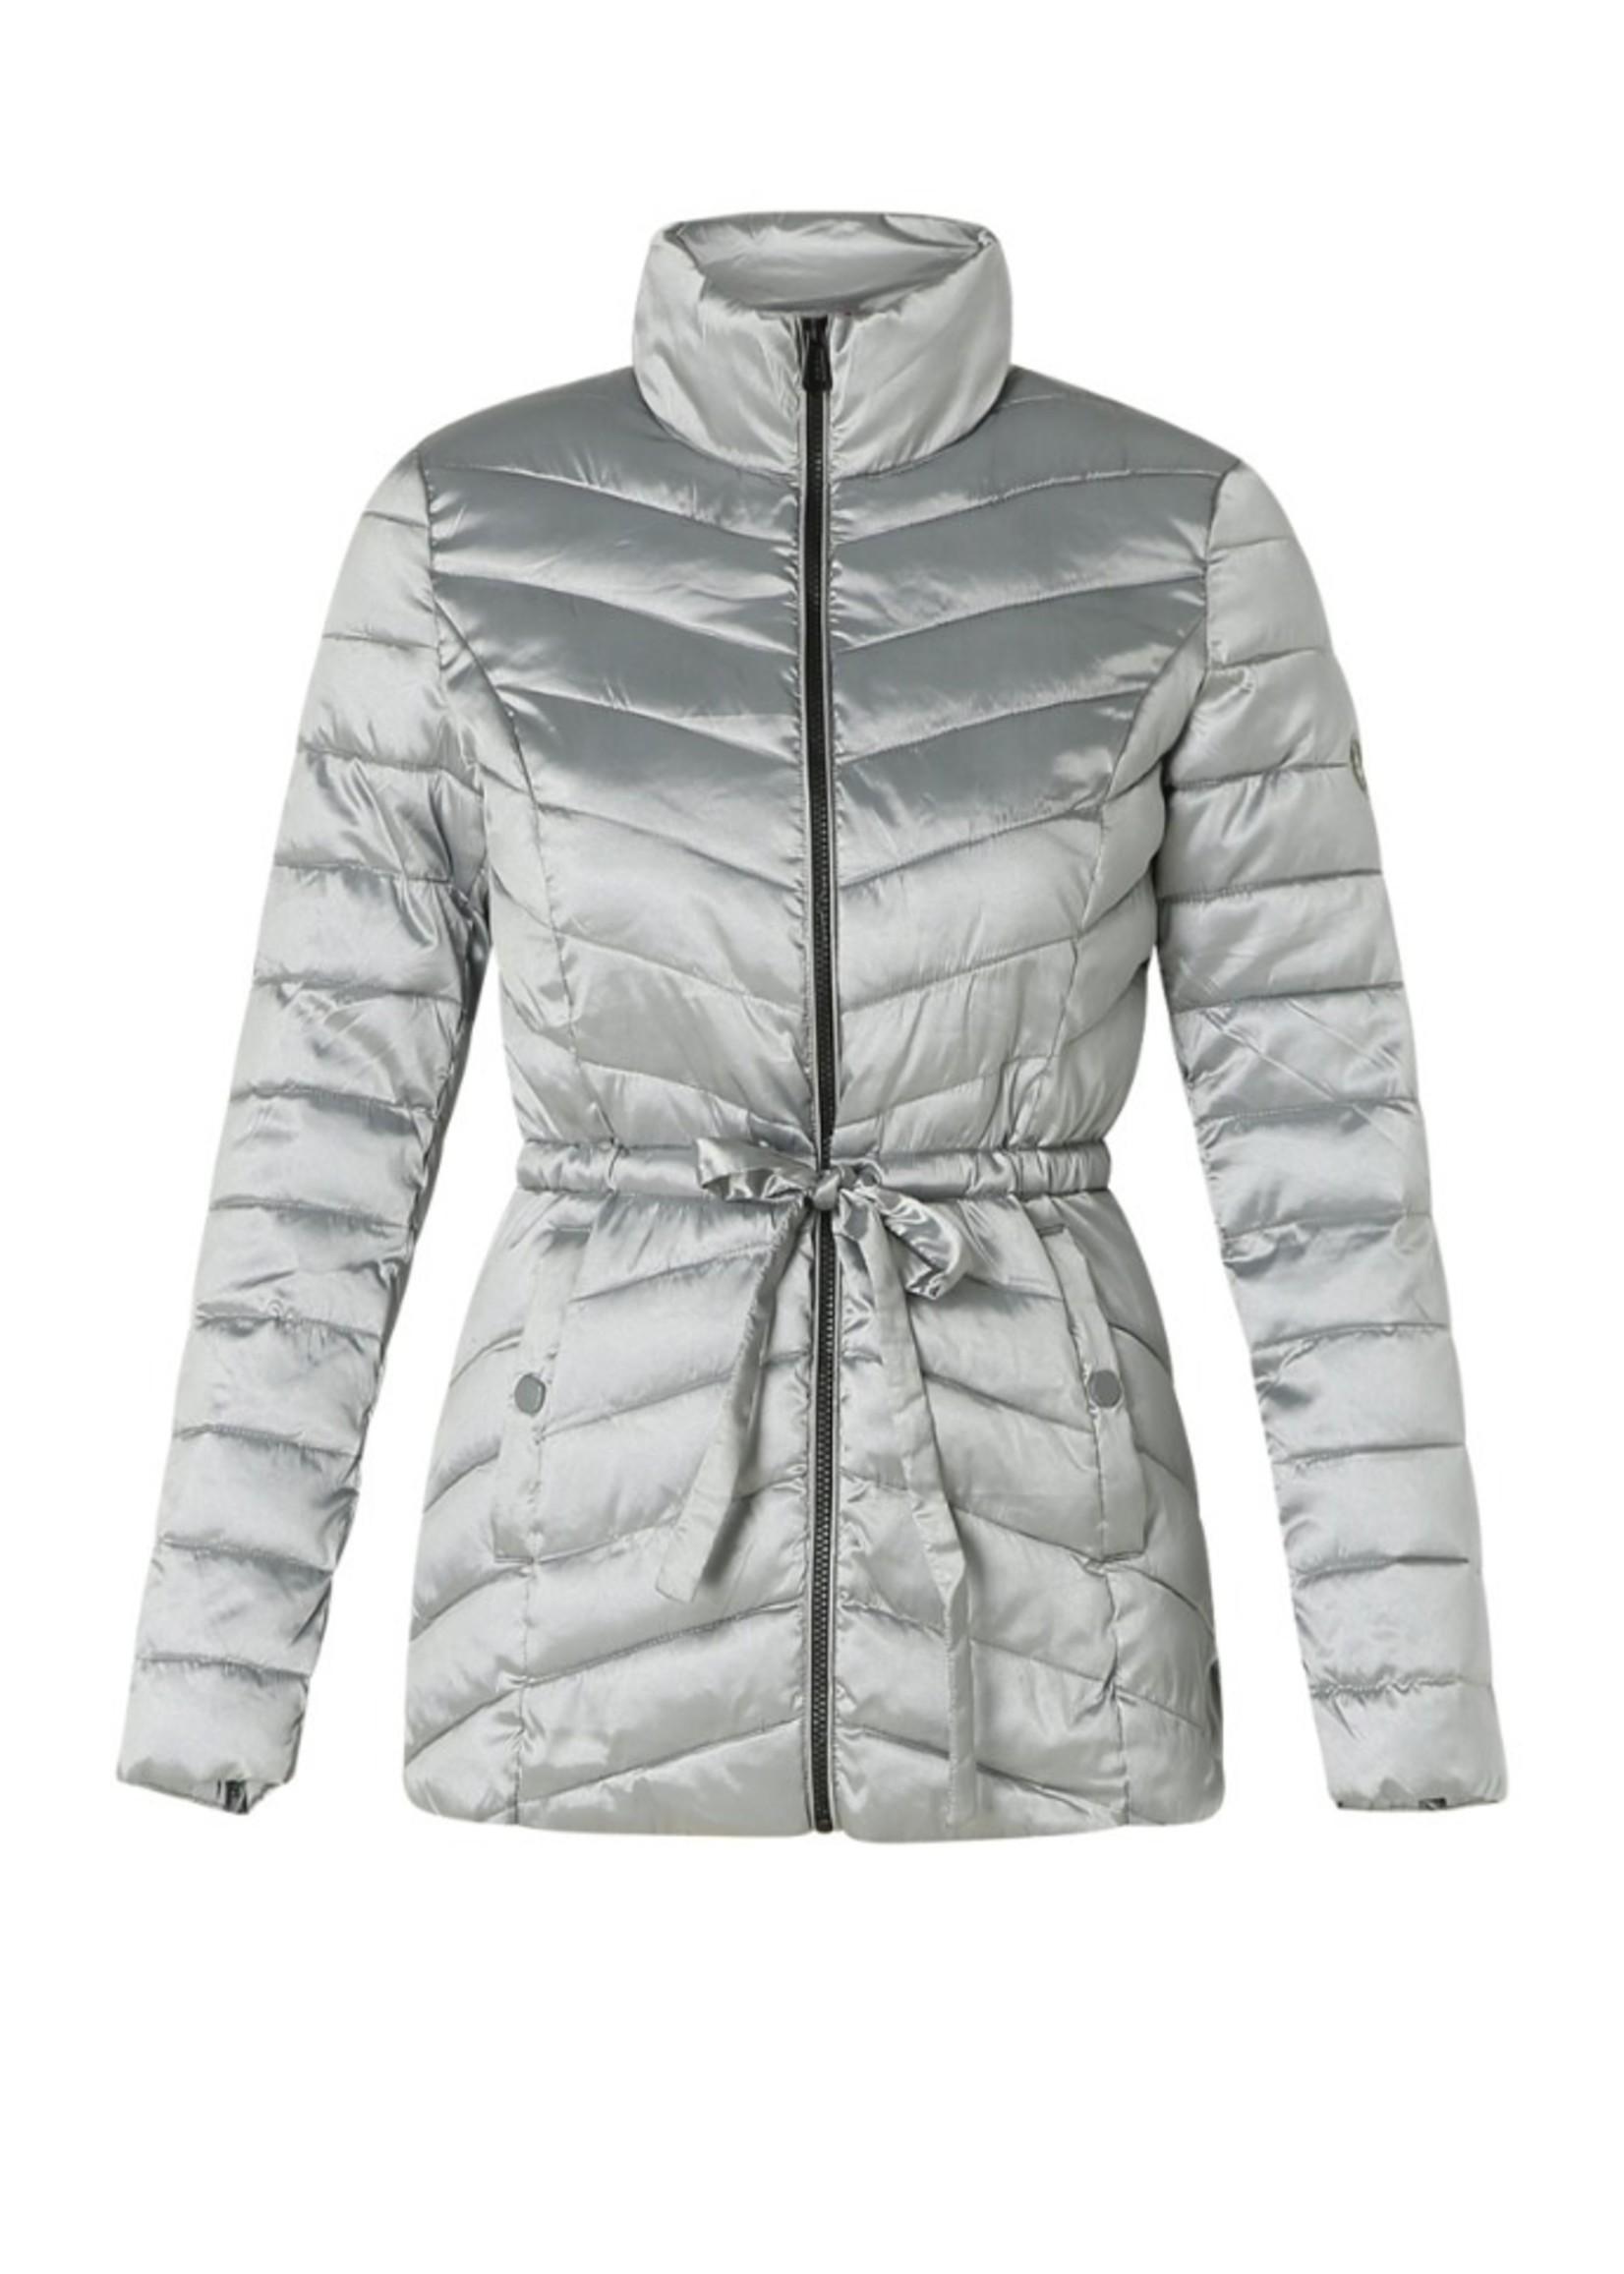 Yest Yest Silver Summer Jacket